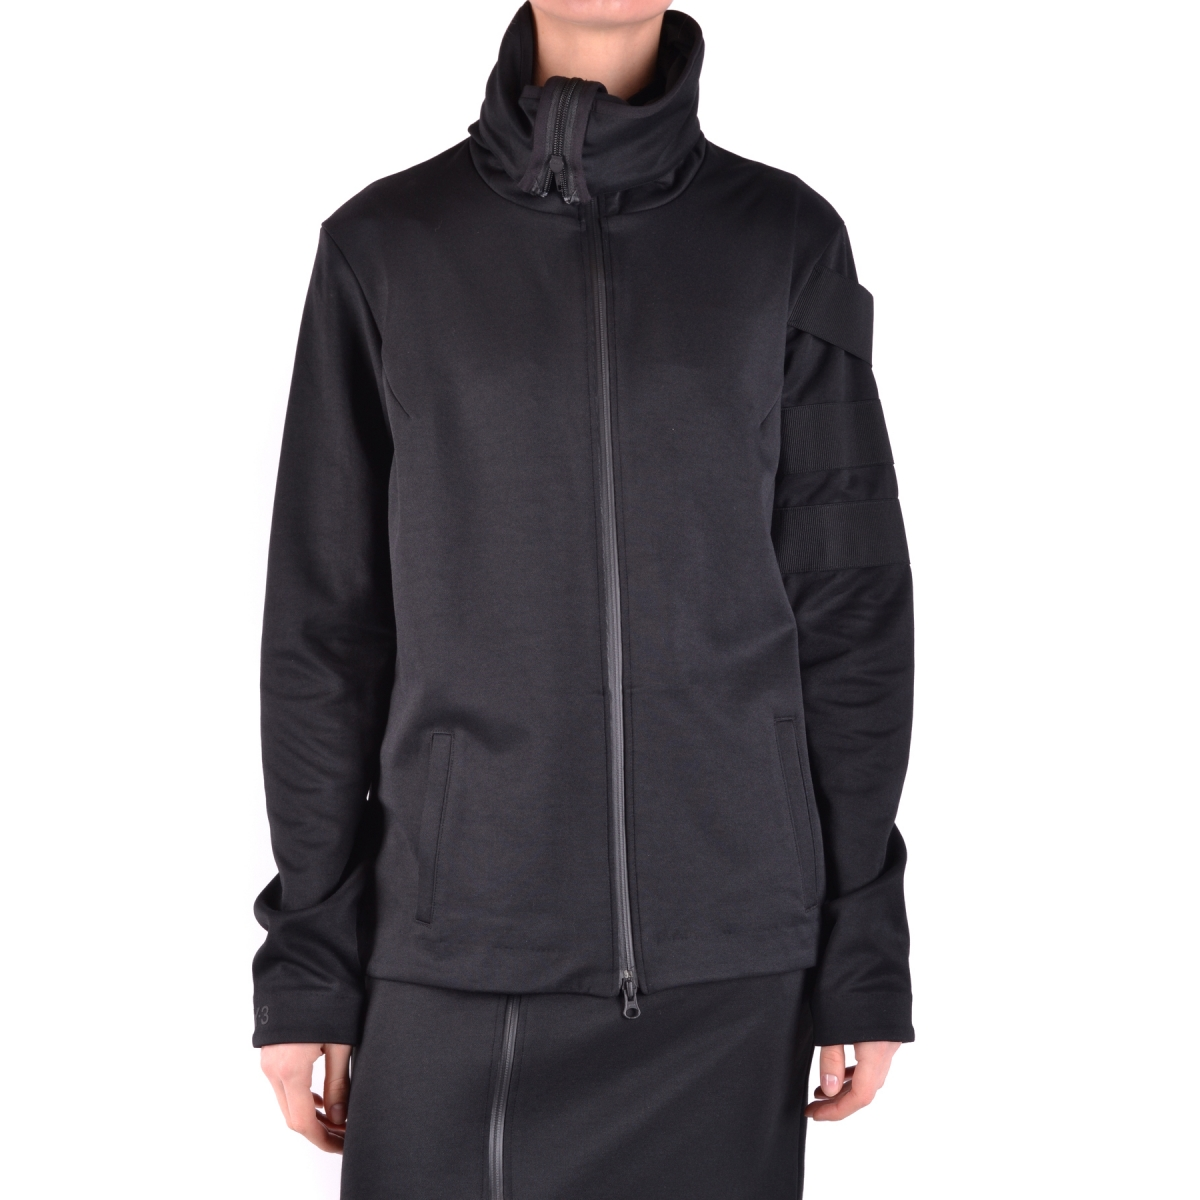 Image is loading Sweatshirt-adidas-y-3-Yohji-Yamamoto-32570it-30 b92d5d5757b